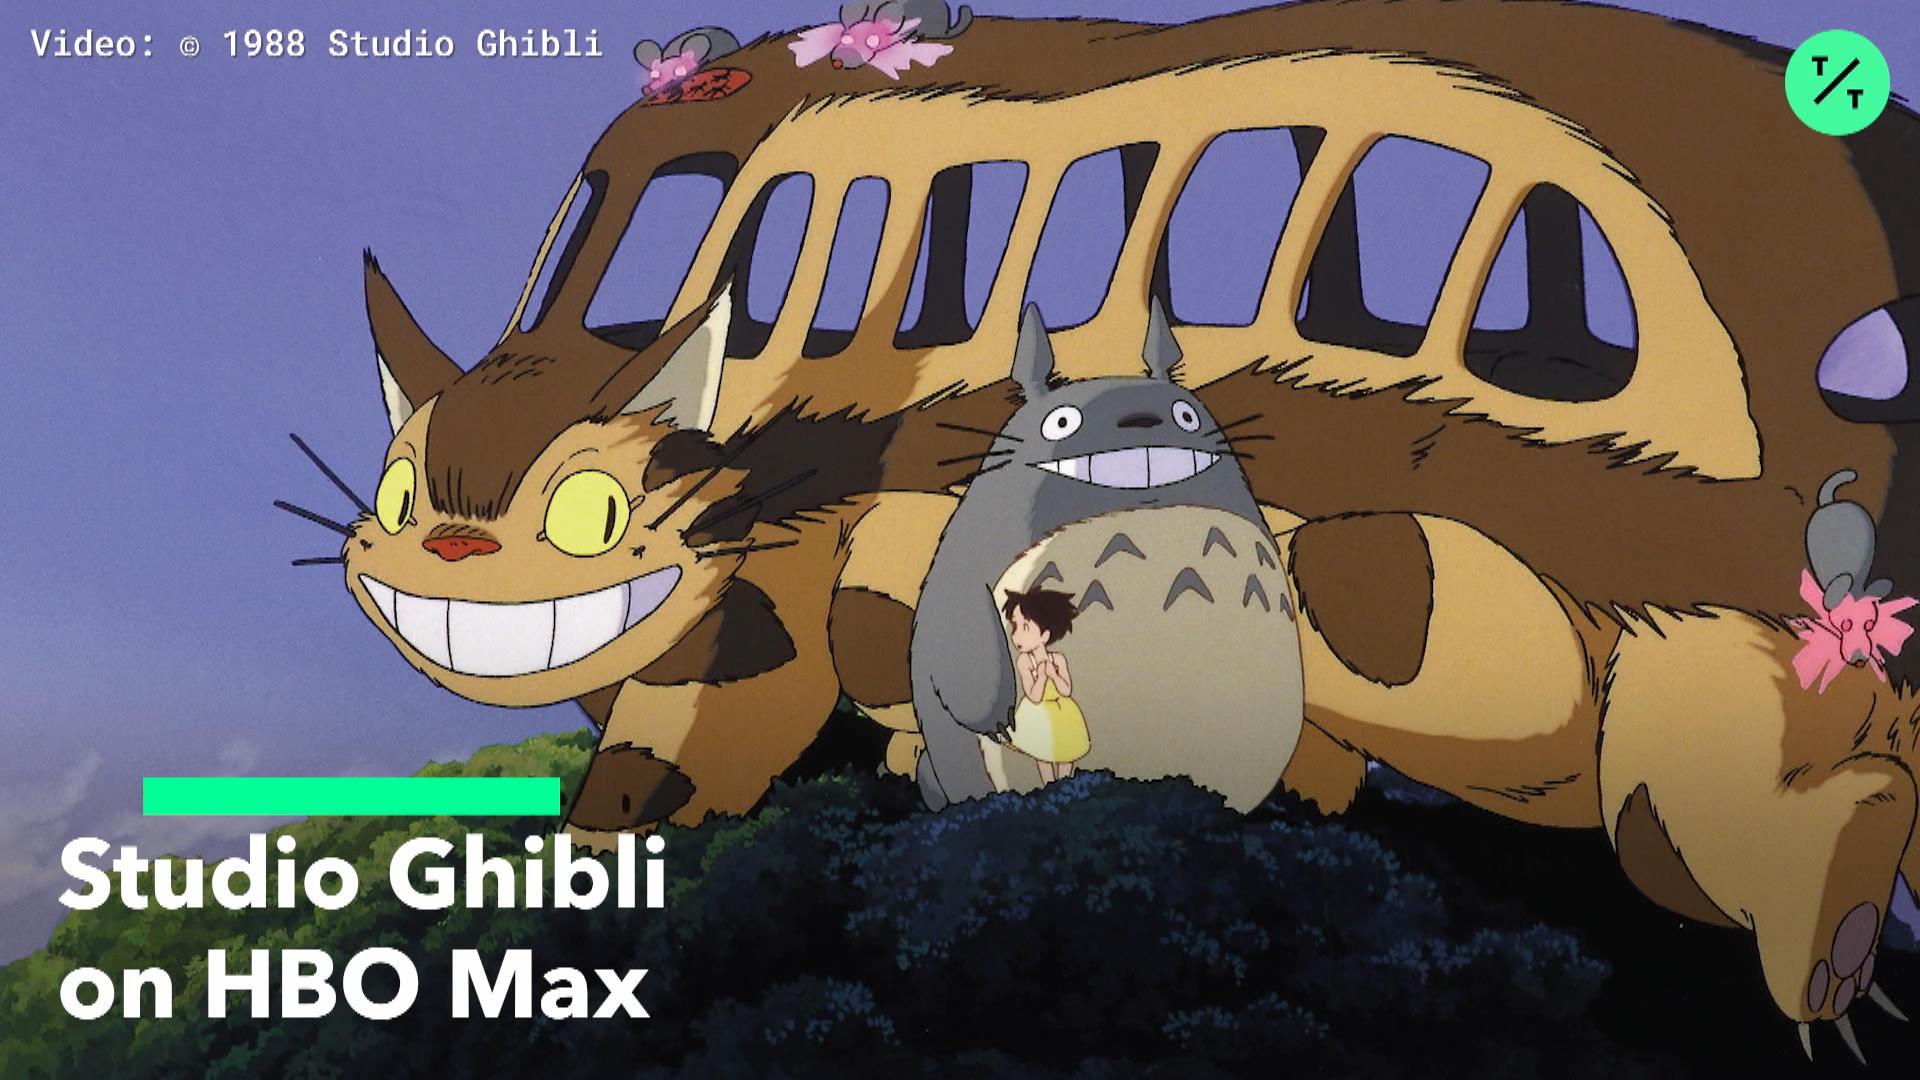 Studio Ghibli on HBO Max